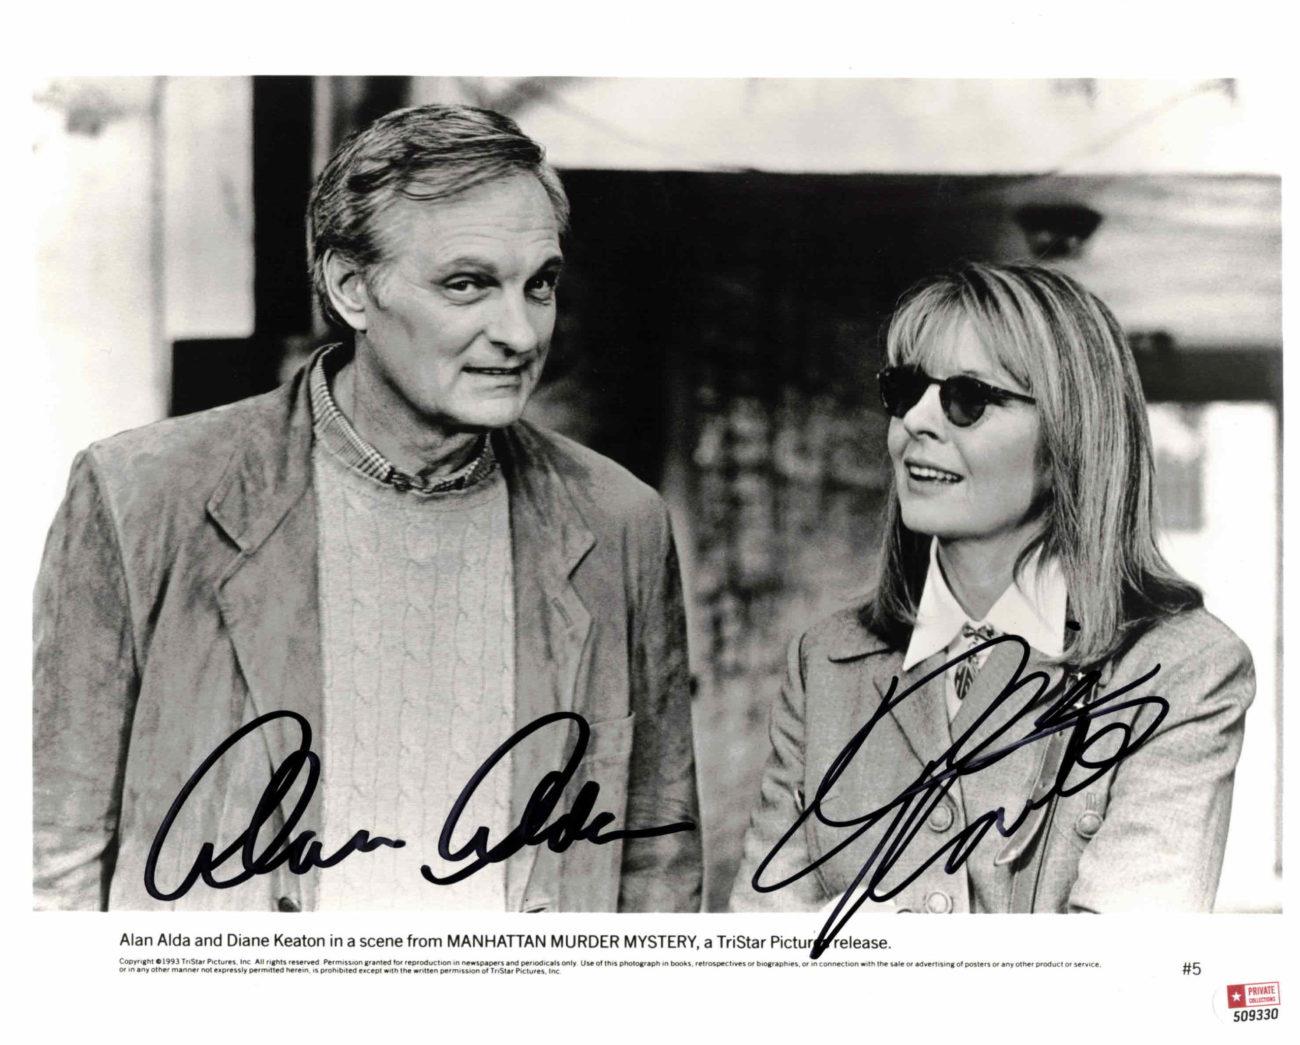 Alan Alda & Diane Keaton - autogram